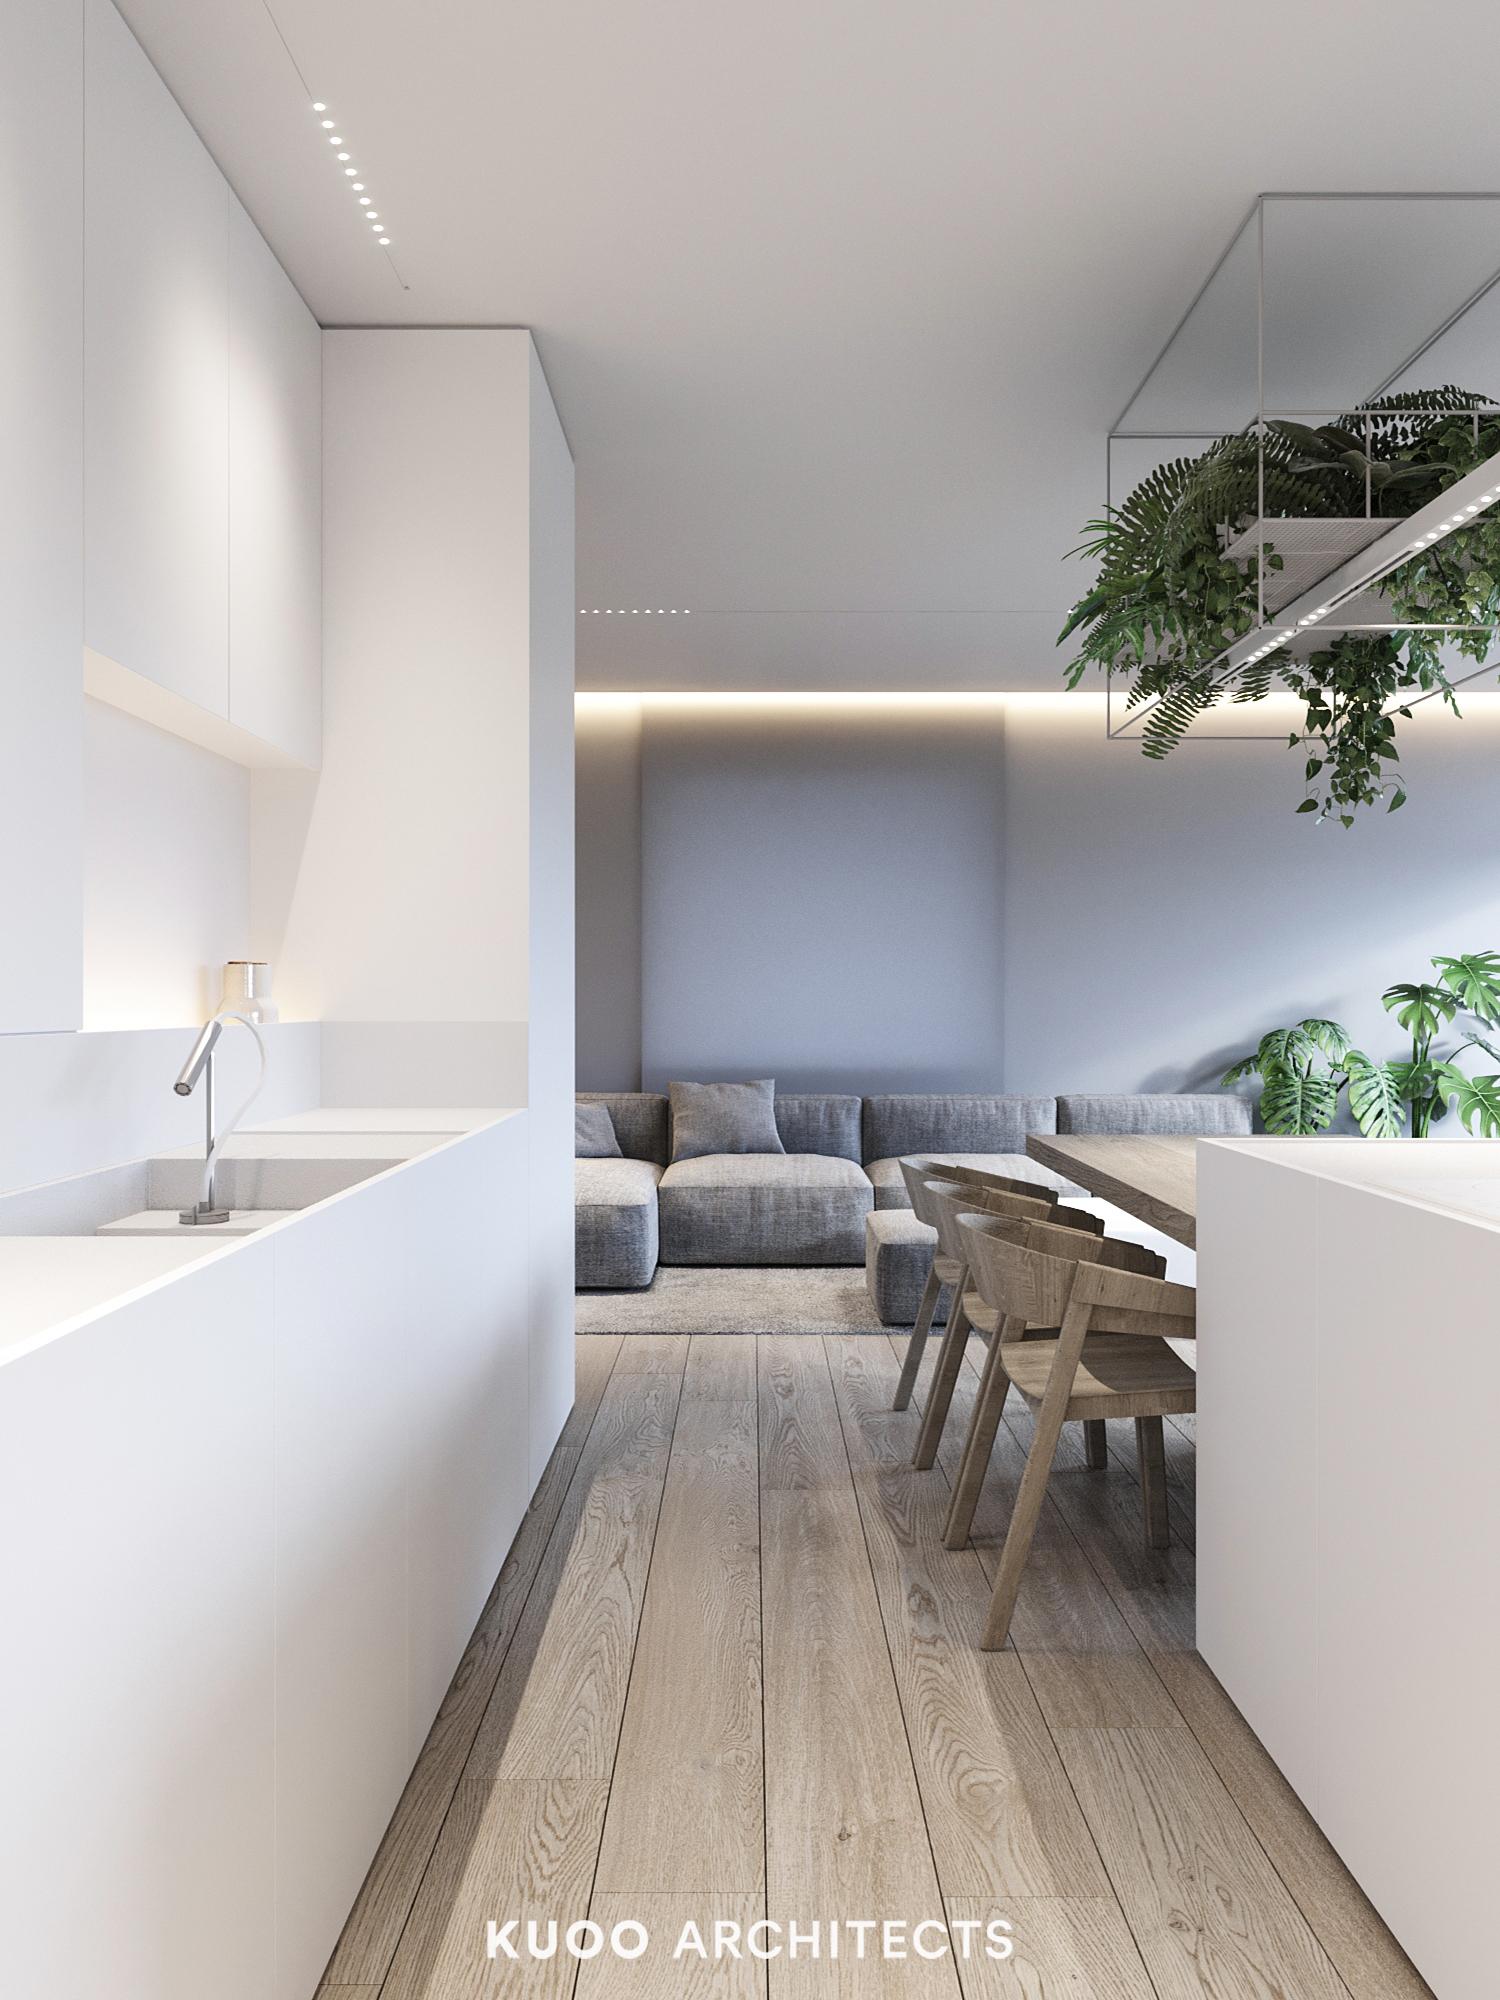 kuoo_architects_ap_warsaw_8_04